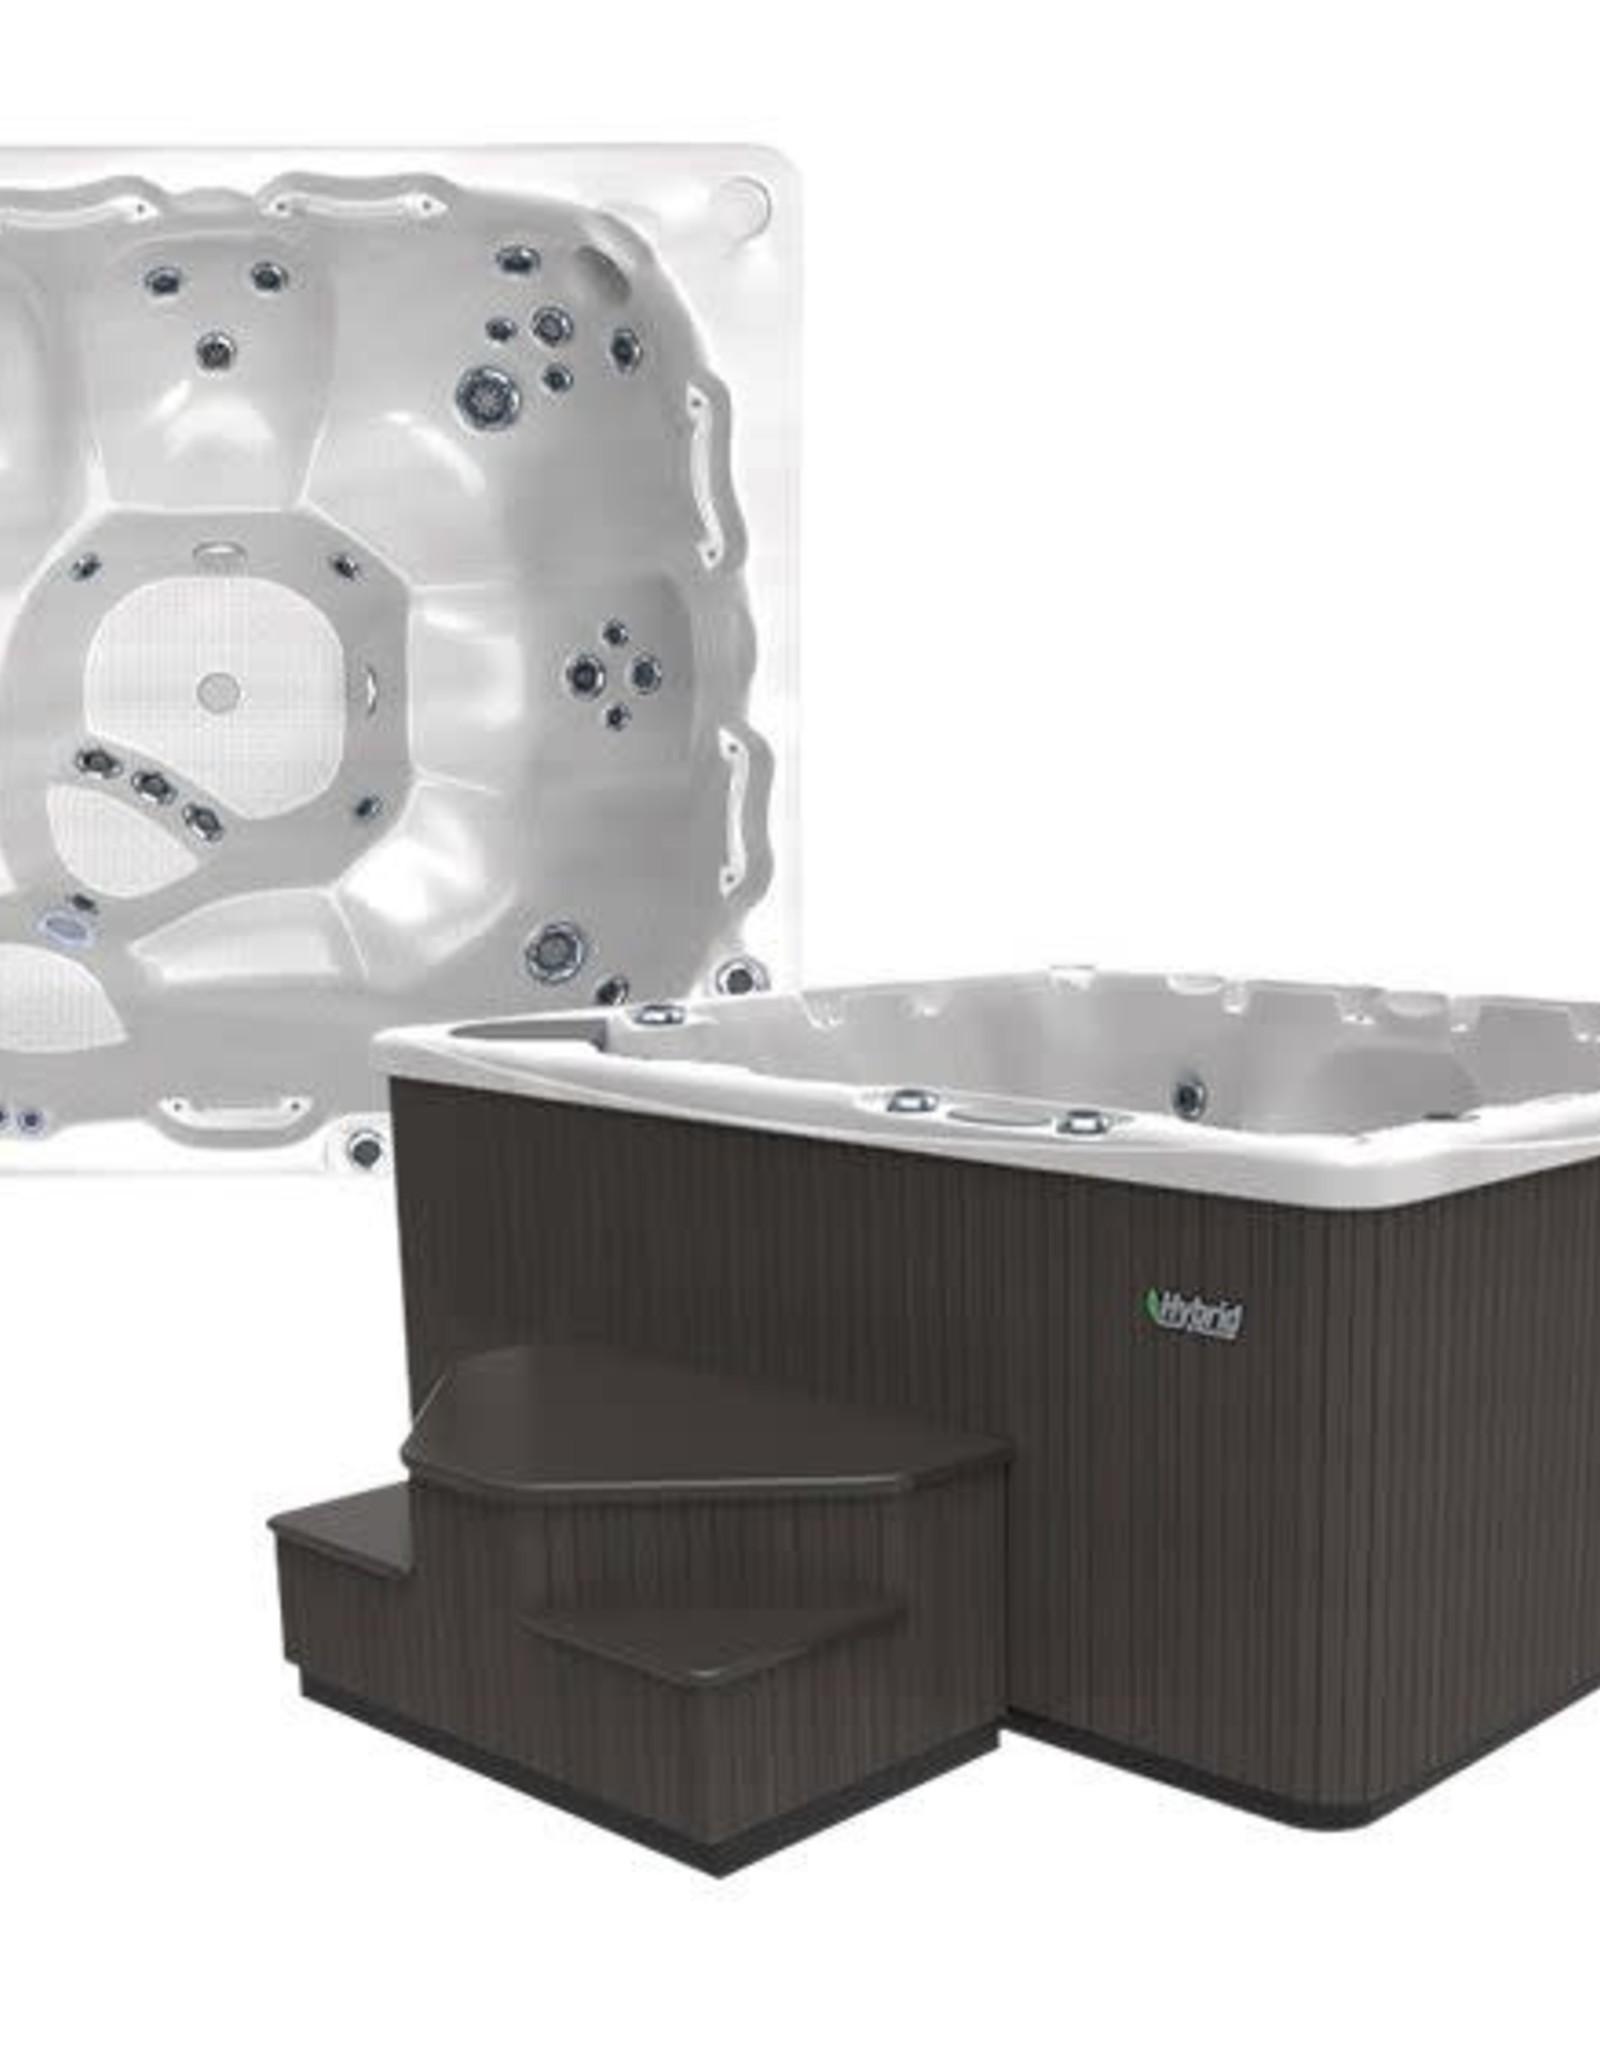 BEACHCOMBER BEACHCOMBER -MODEL 550 HYBRID4® QS